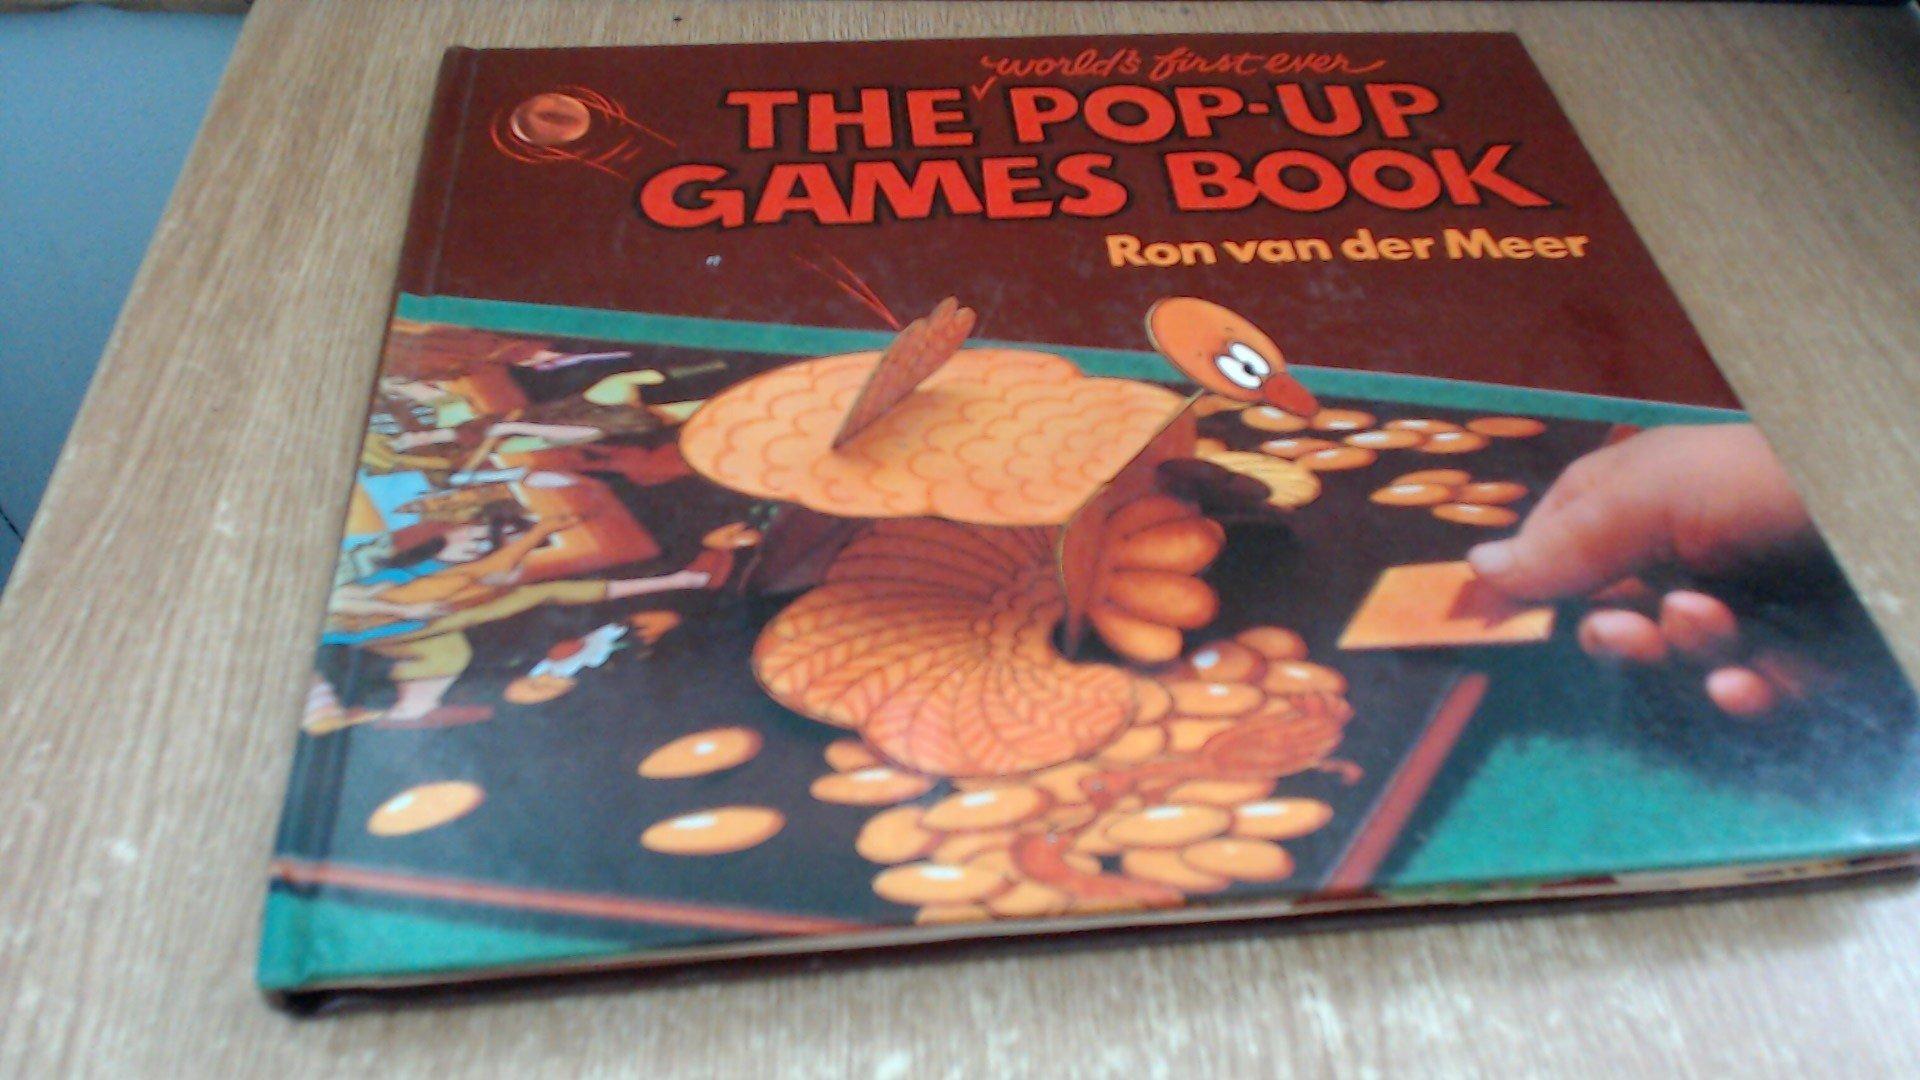 Games: Pop-up Book: Amazon.es: Meer, Ron Van Der: Libros en ...